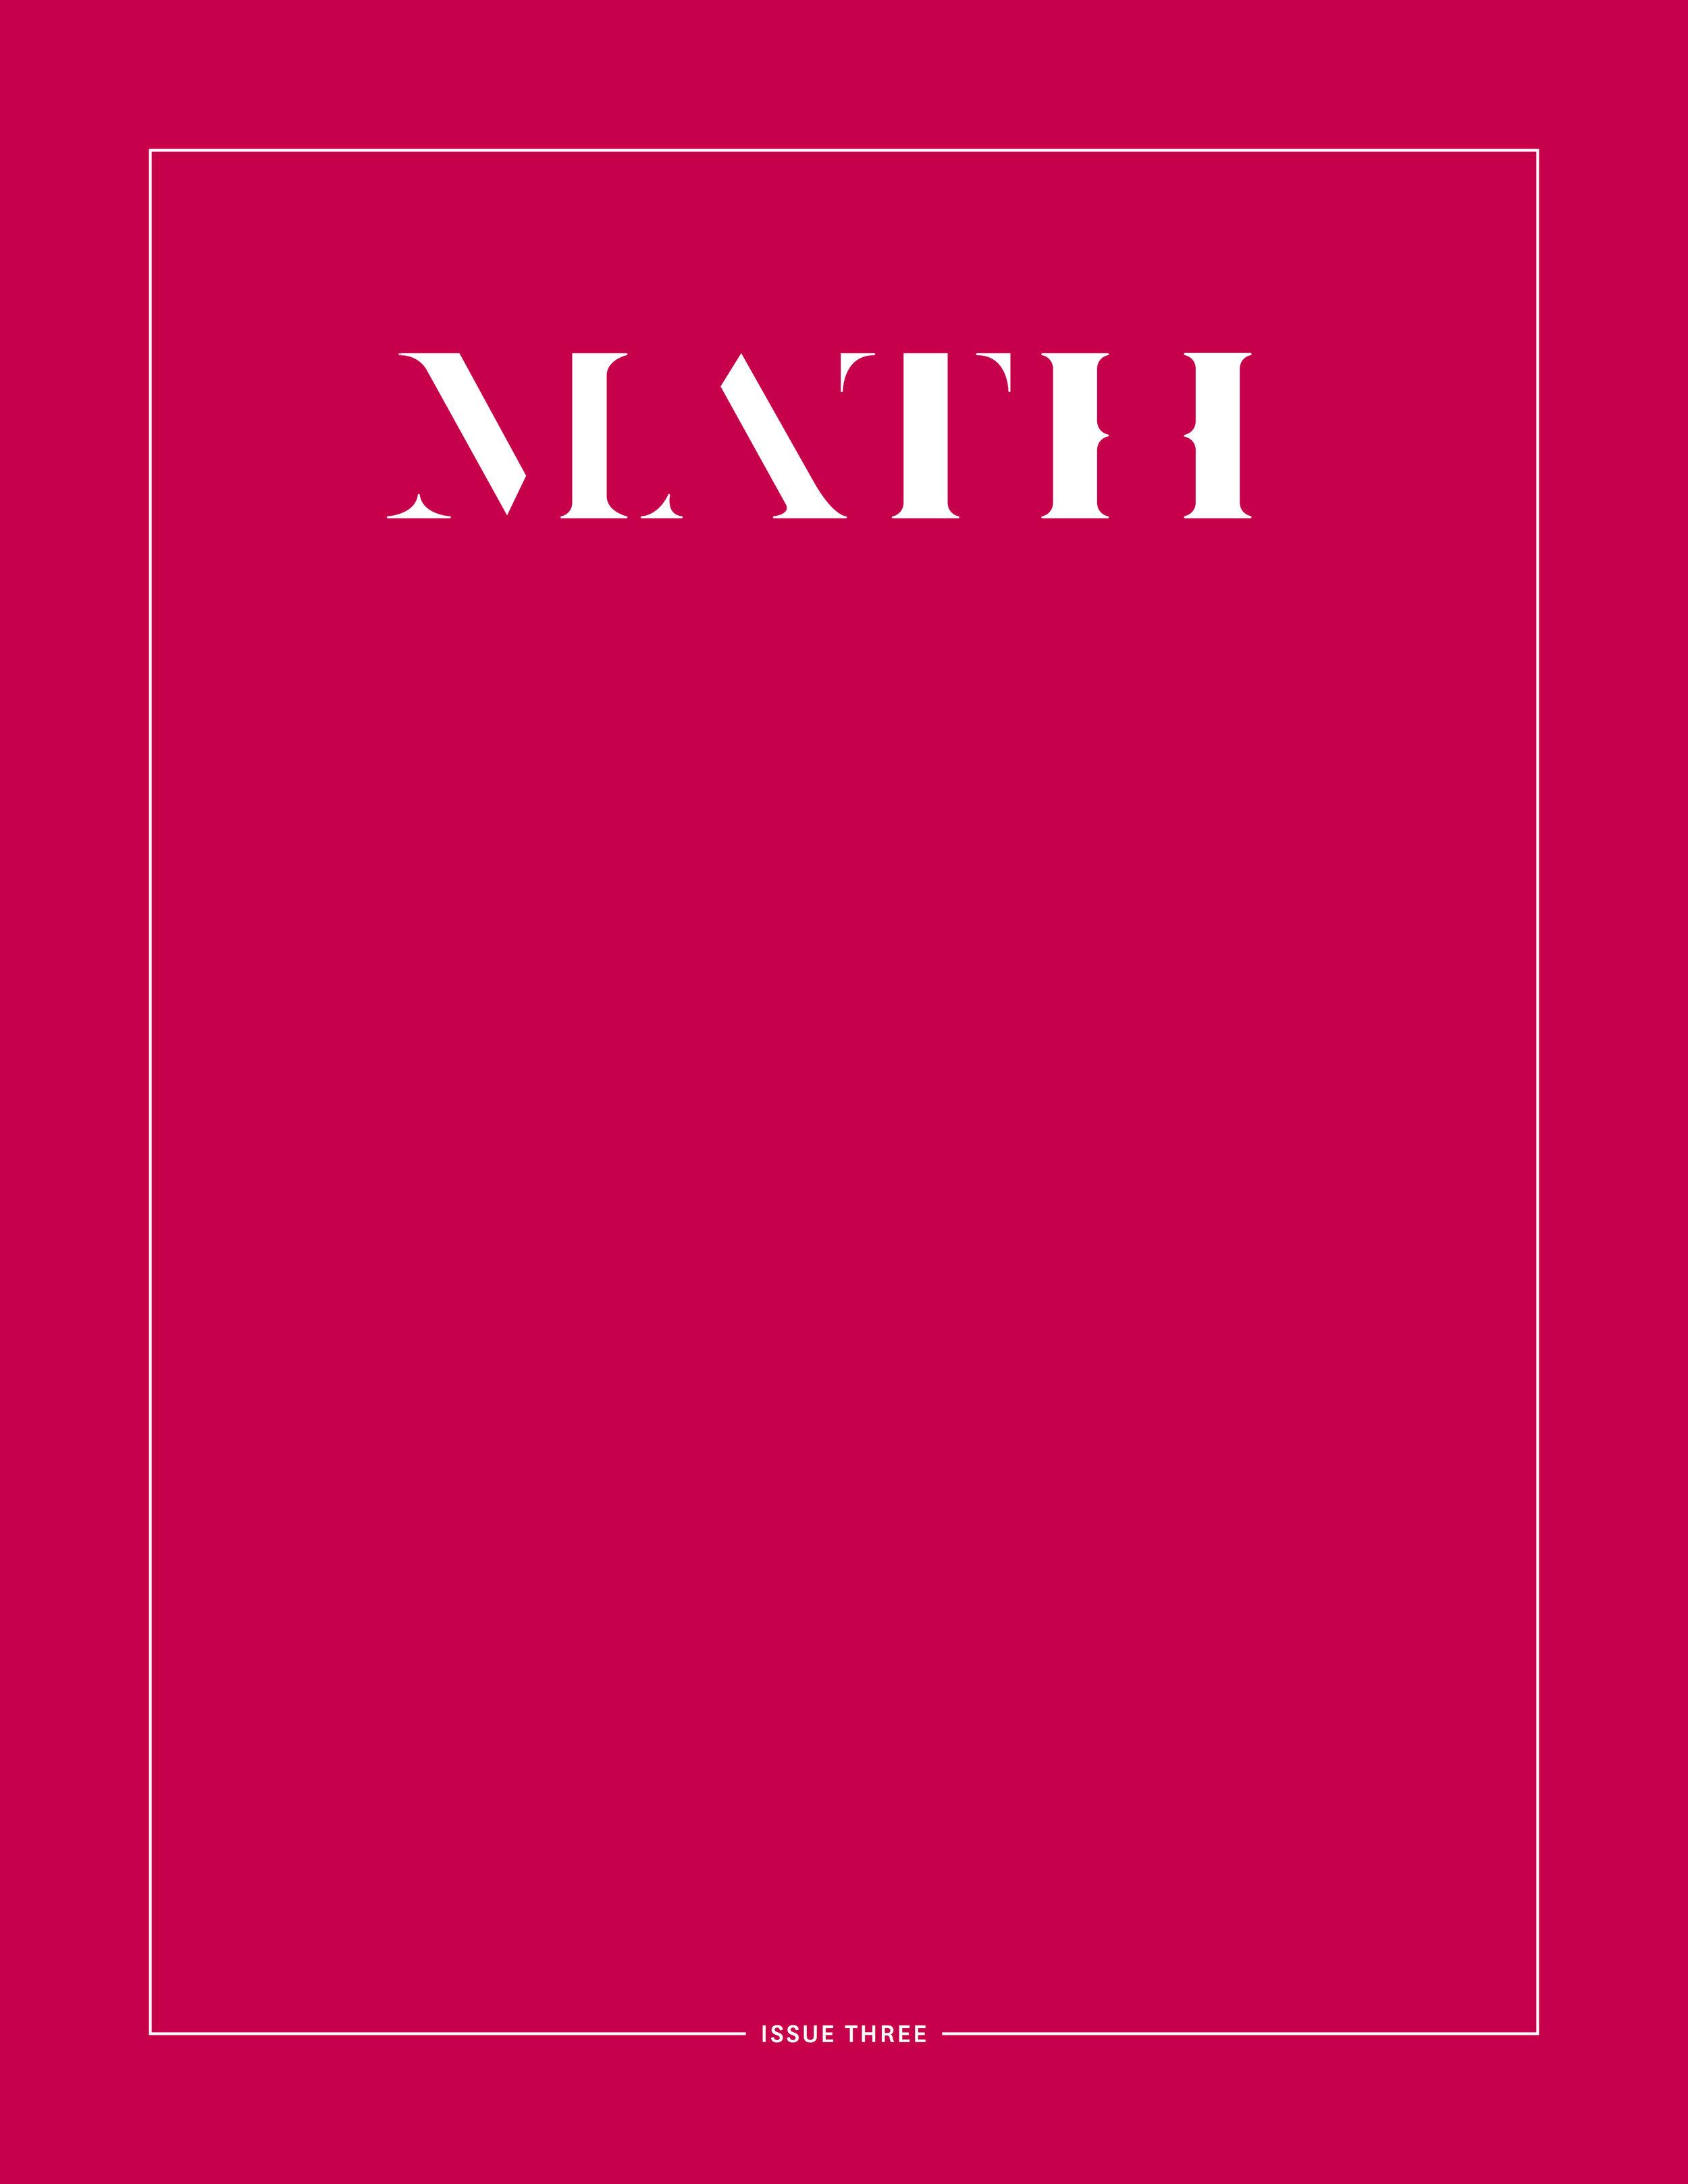 MathMagazineIssueThree.COLE.jpg